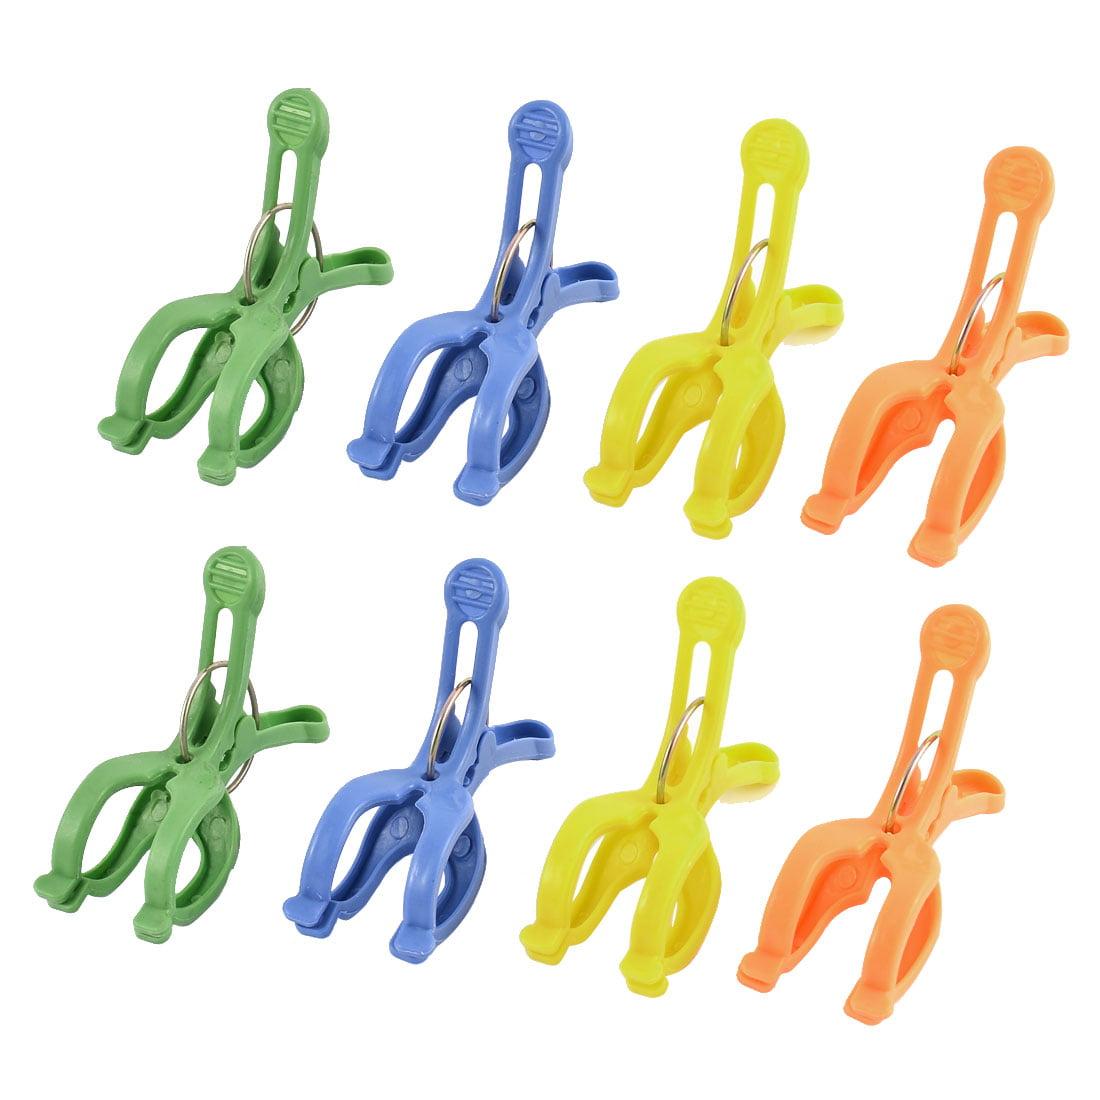 Plastic Clothes Socks Pants Airing Clips Clothespins Hanger Multicolor 8pcs